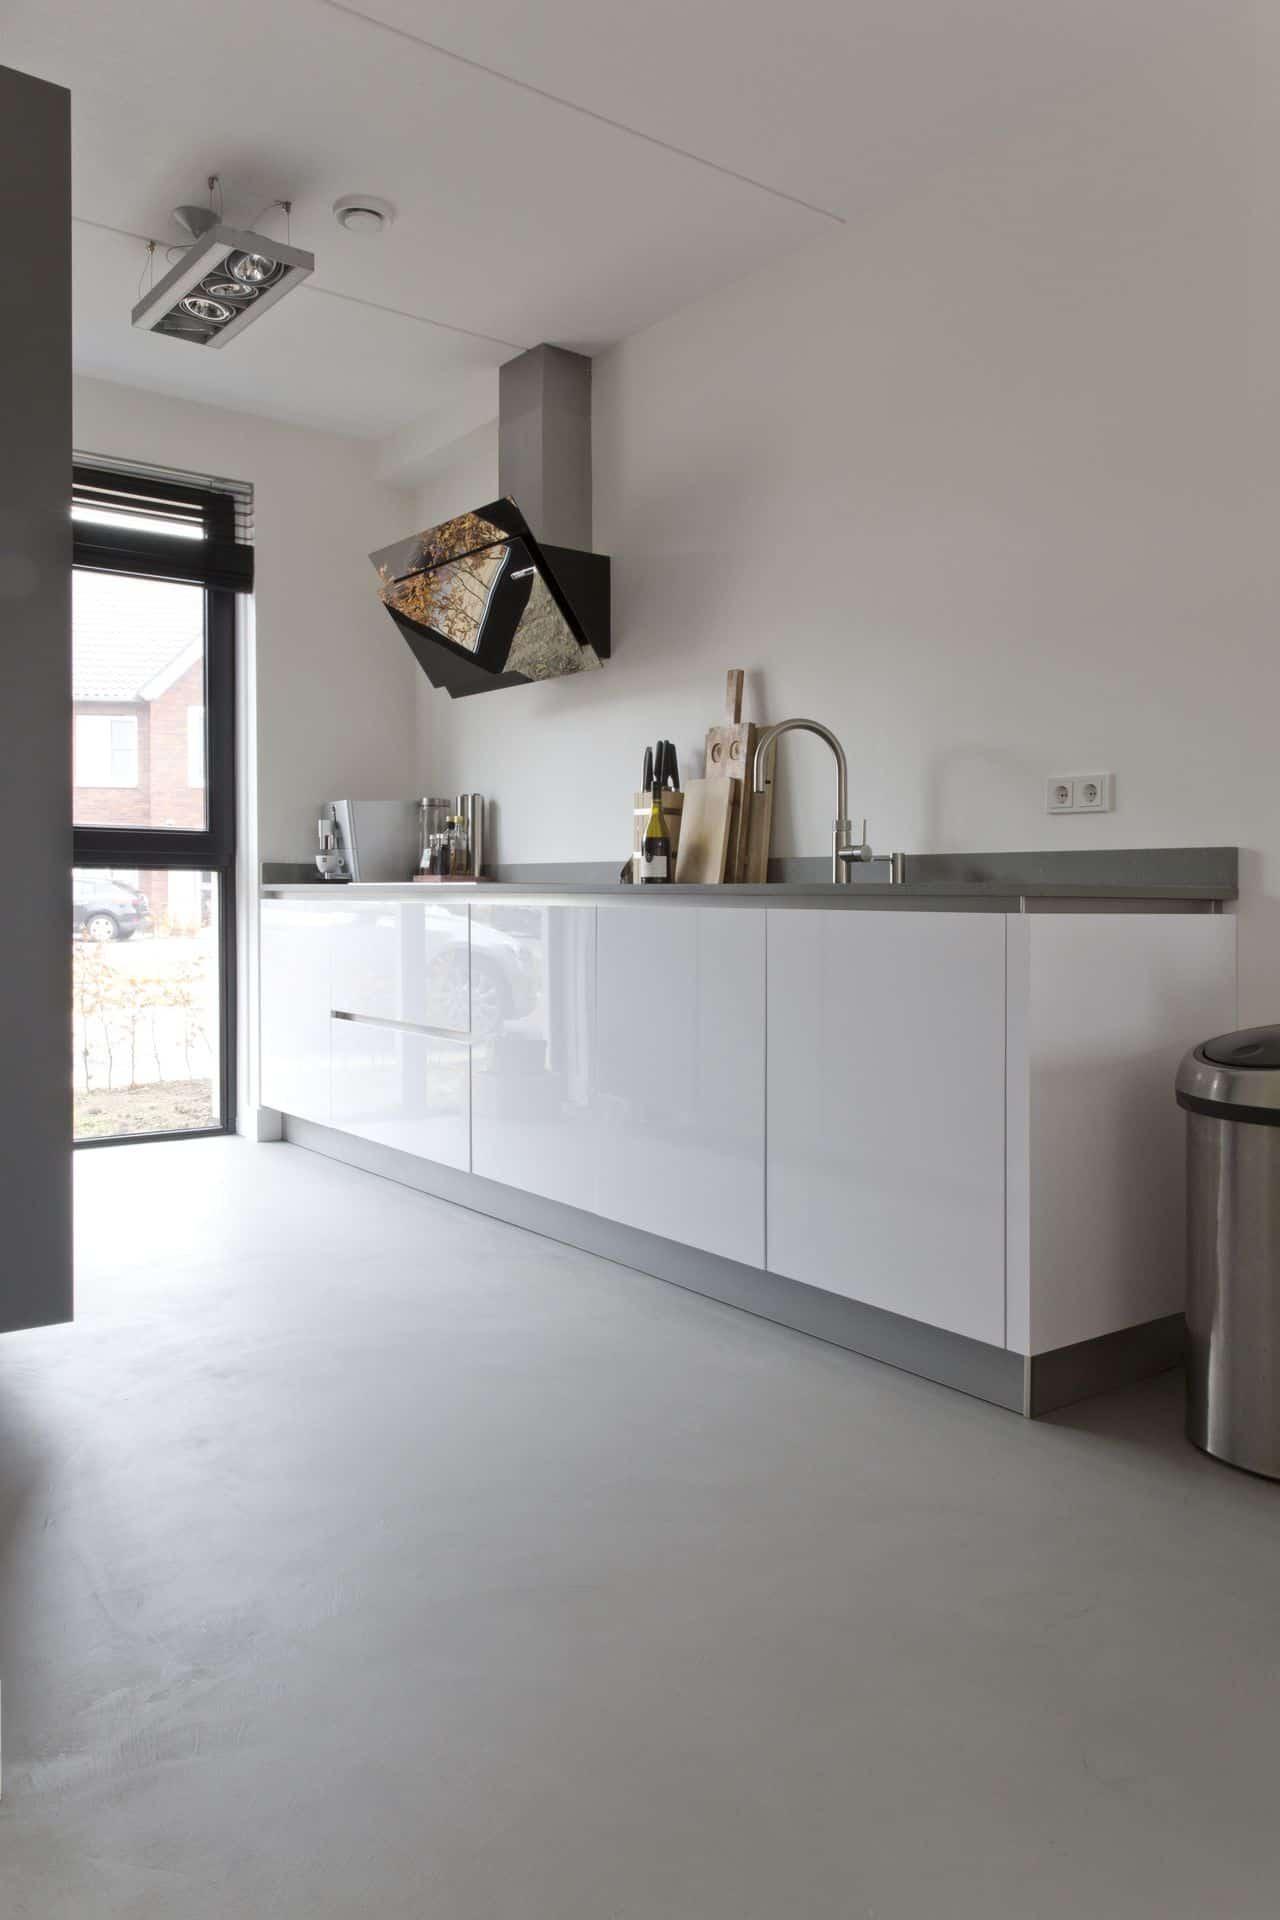 beton ciré, betonlook, betonlook vloer keuken